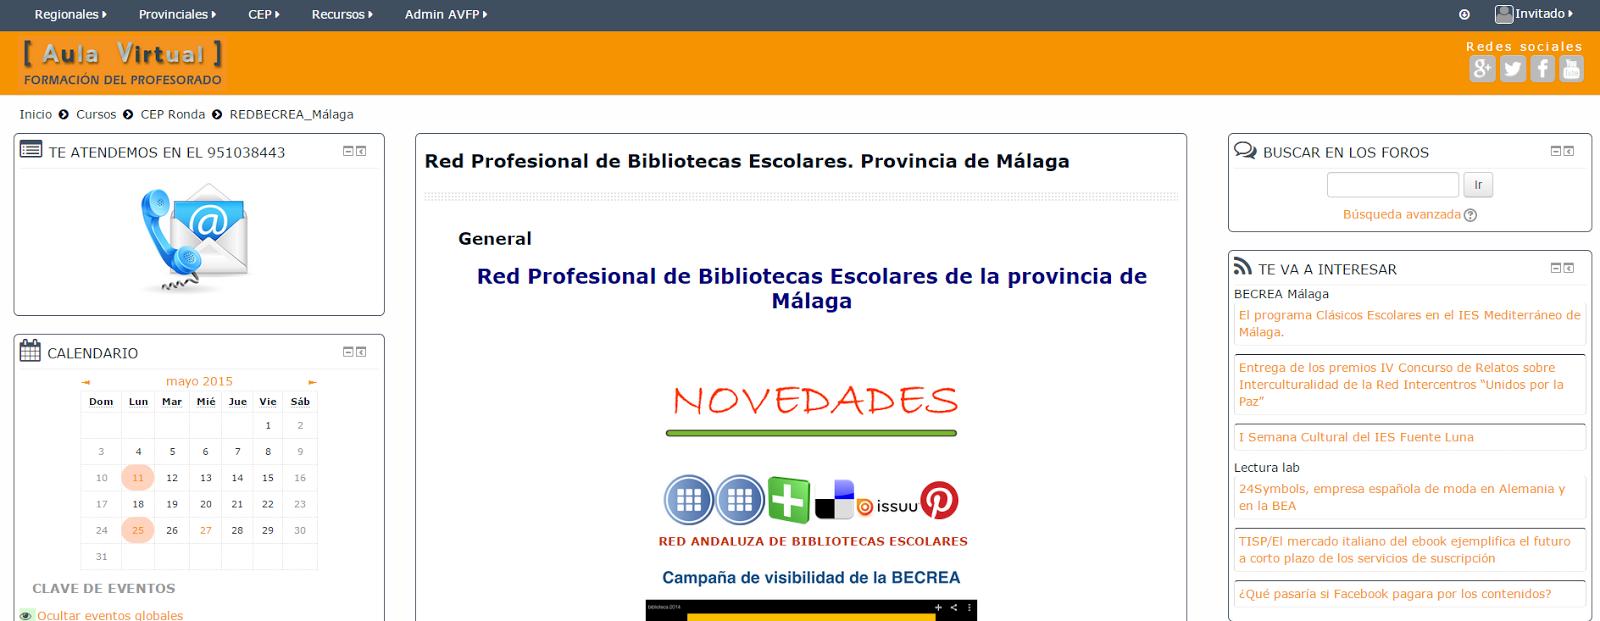 RED PROFESIONAL DE BIBLIOTECAS ESCOLARES. PROVINCIA DE MÁLAGA